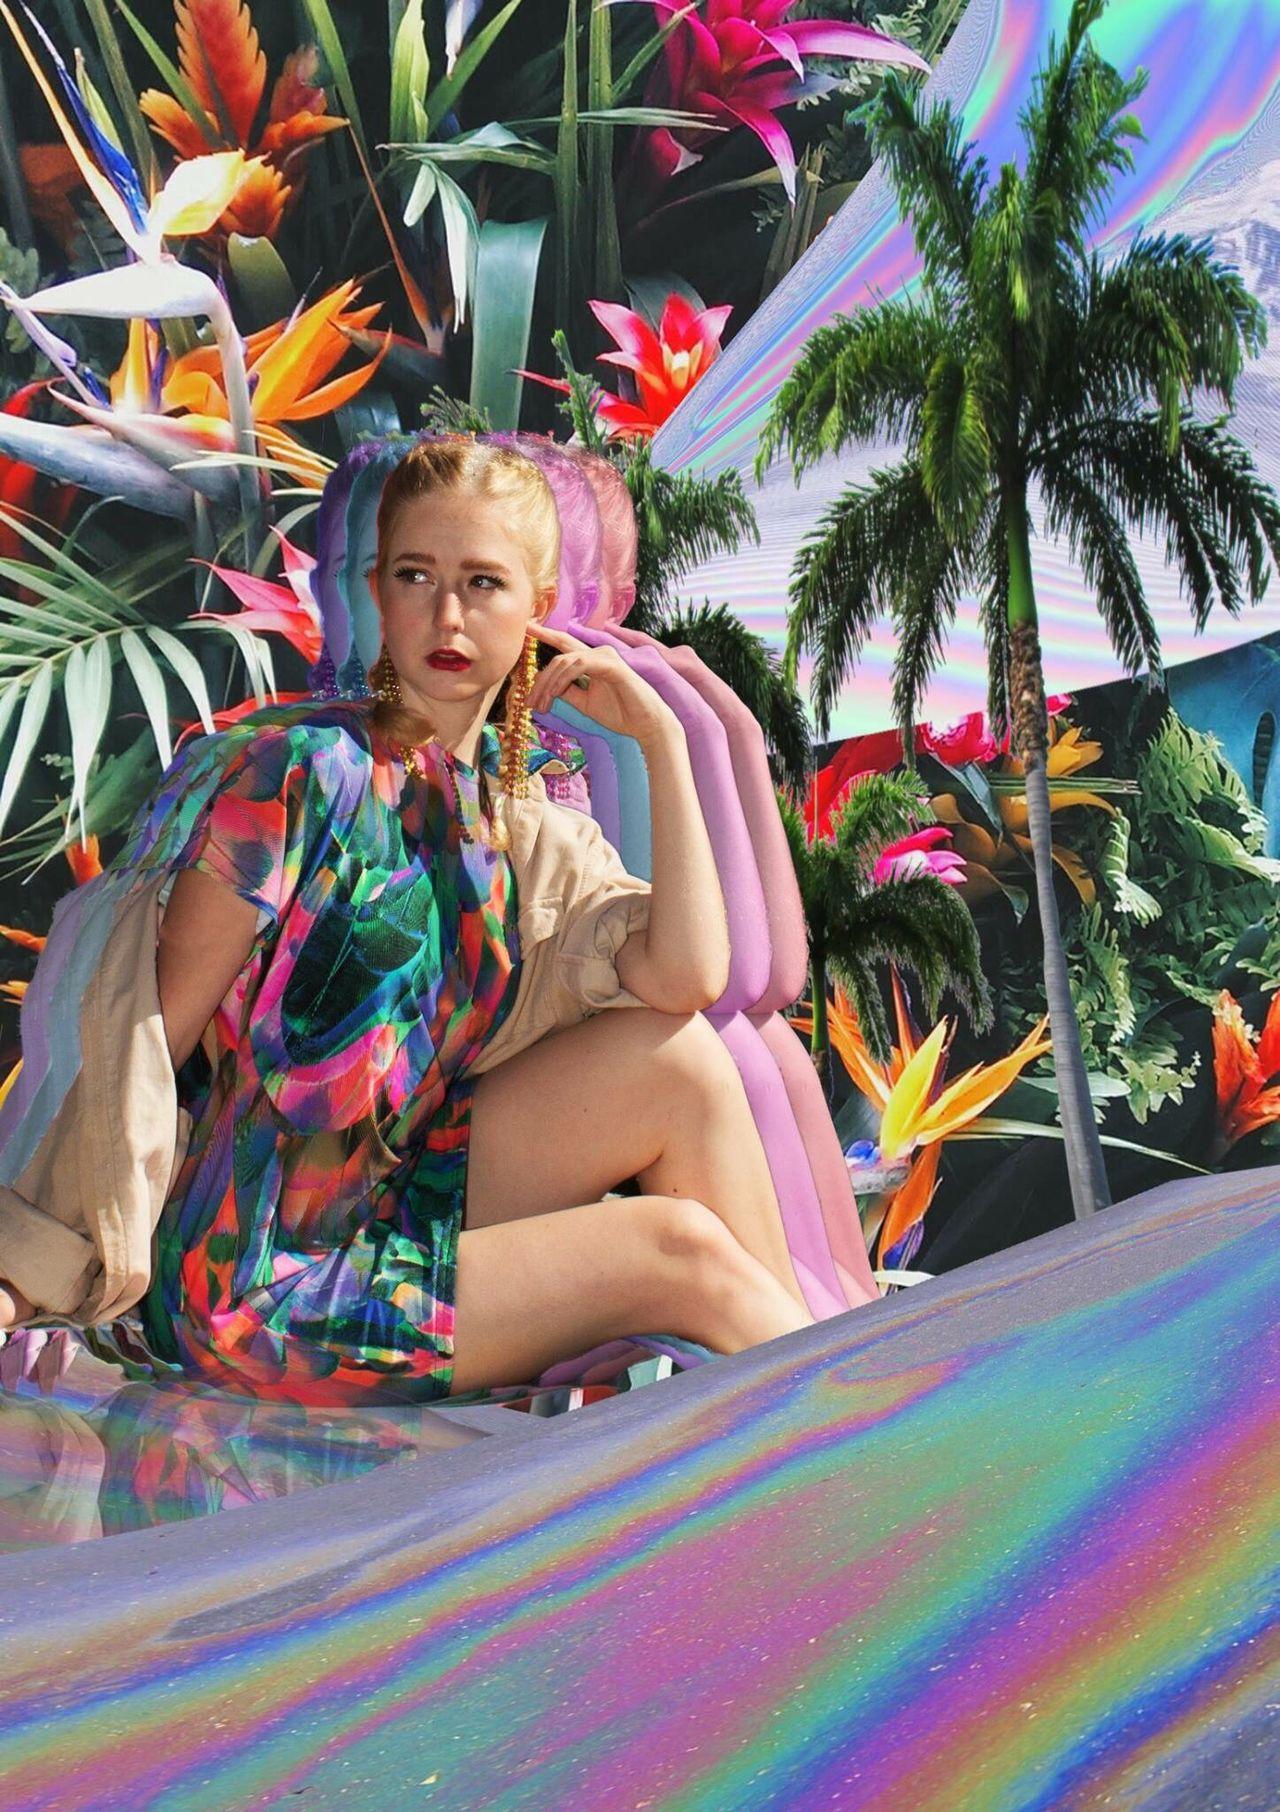 Digital composite image of woman sitting against plants